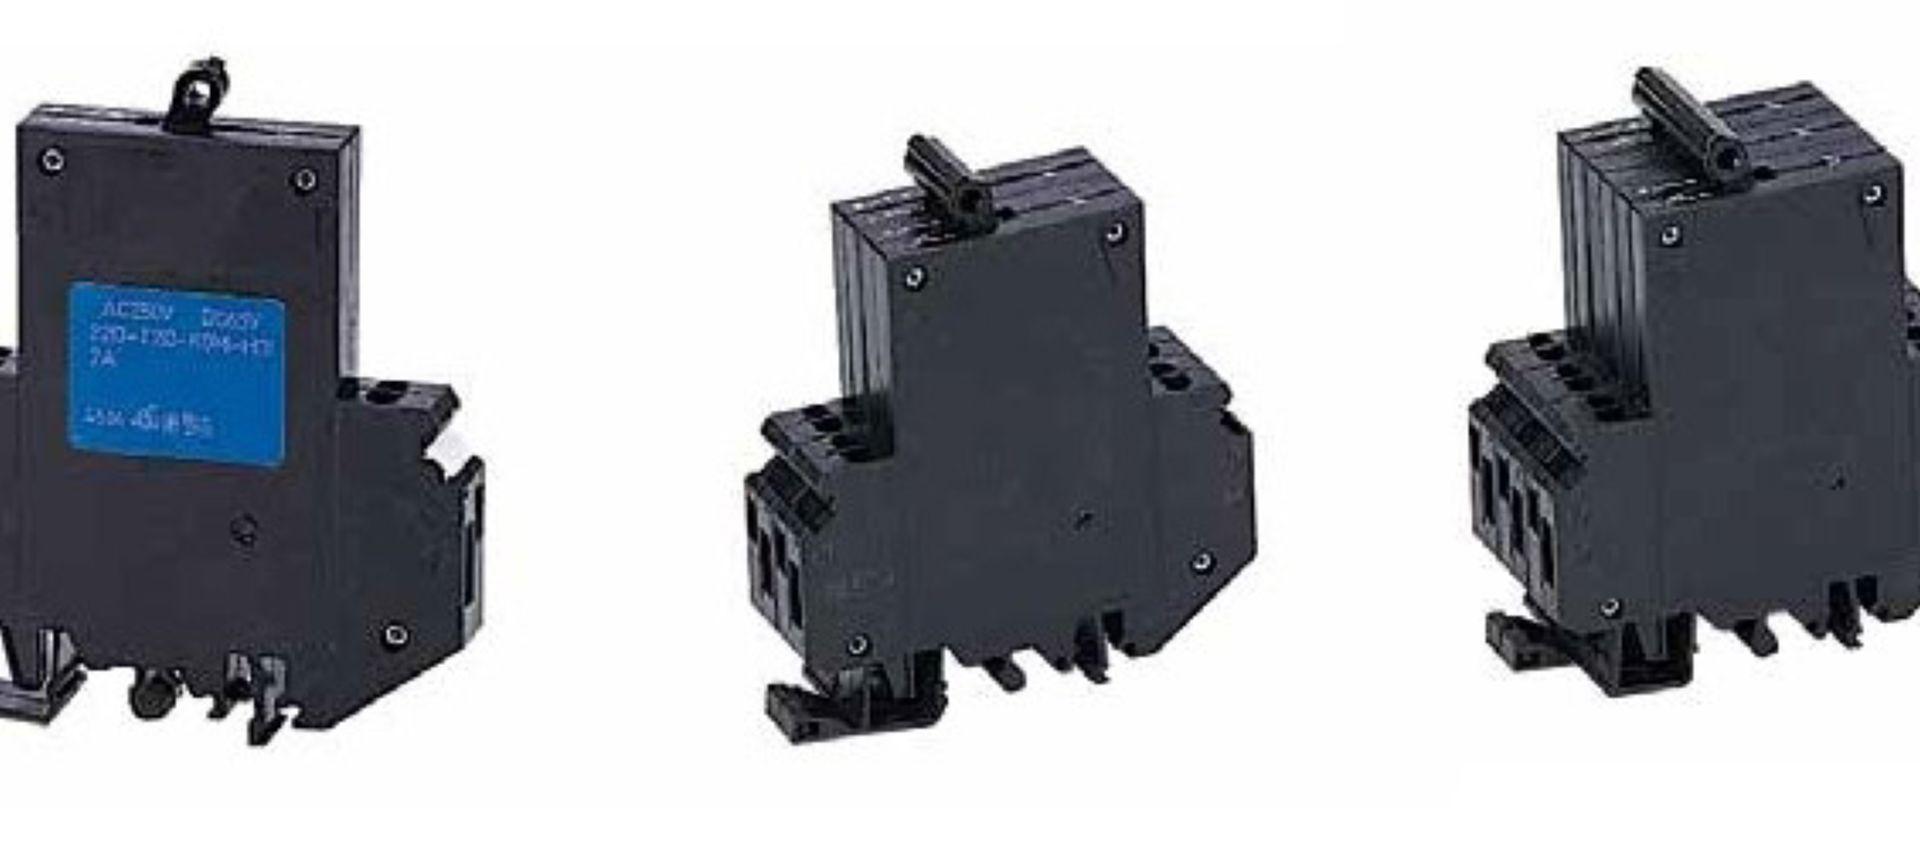 CB2200 Series Supplementary Circuit Breakers